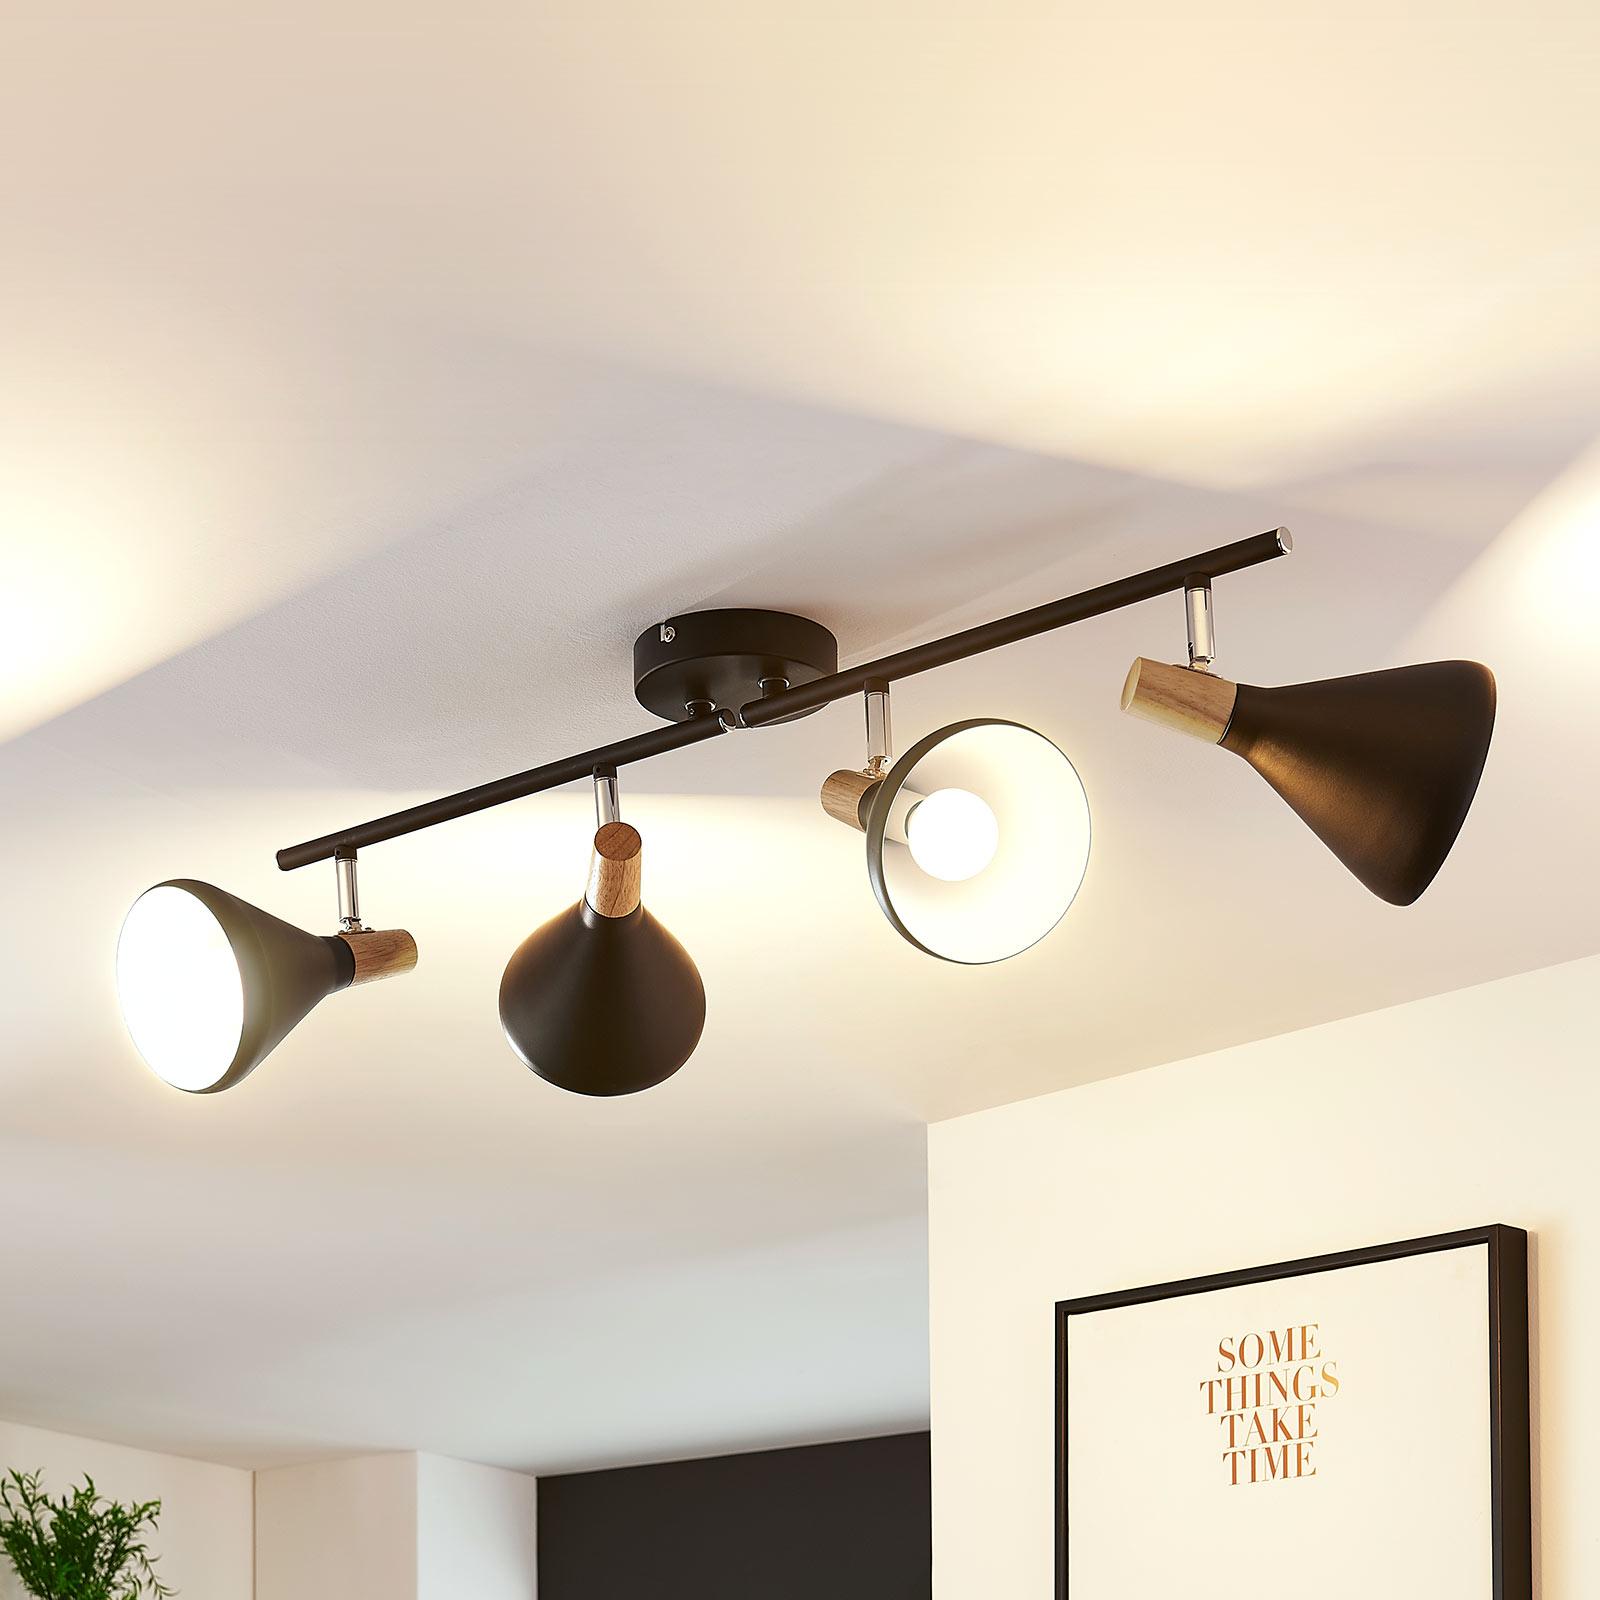 Foco de techo LED Arina negro, detalles en madera